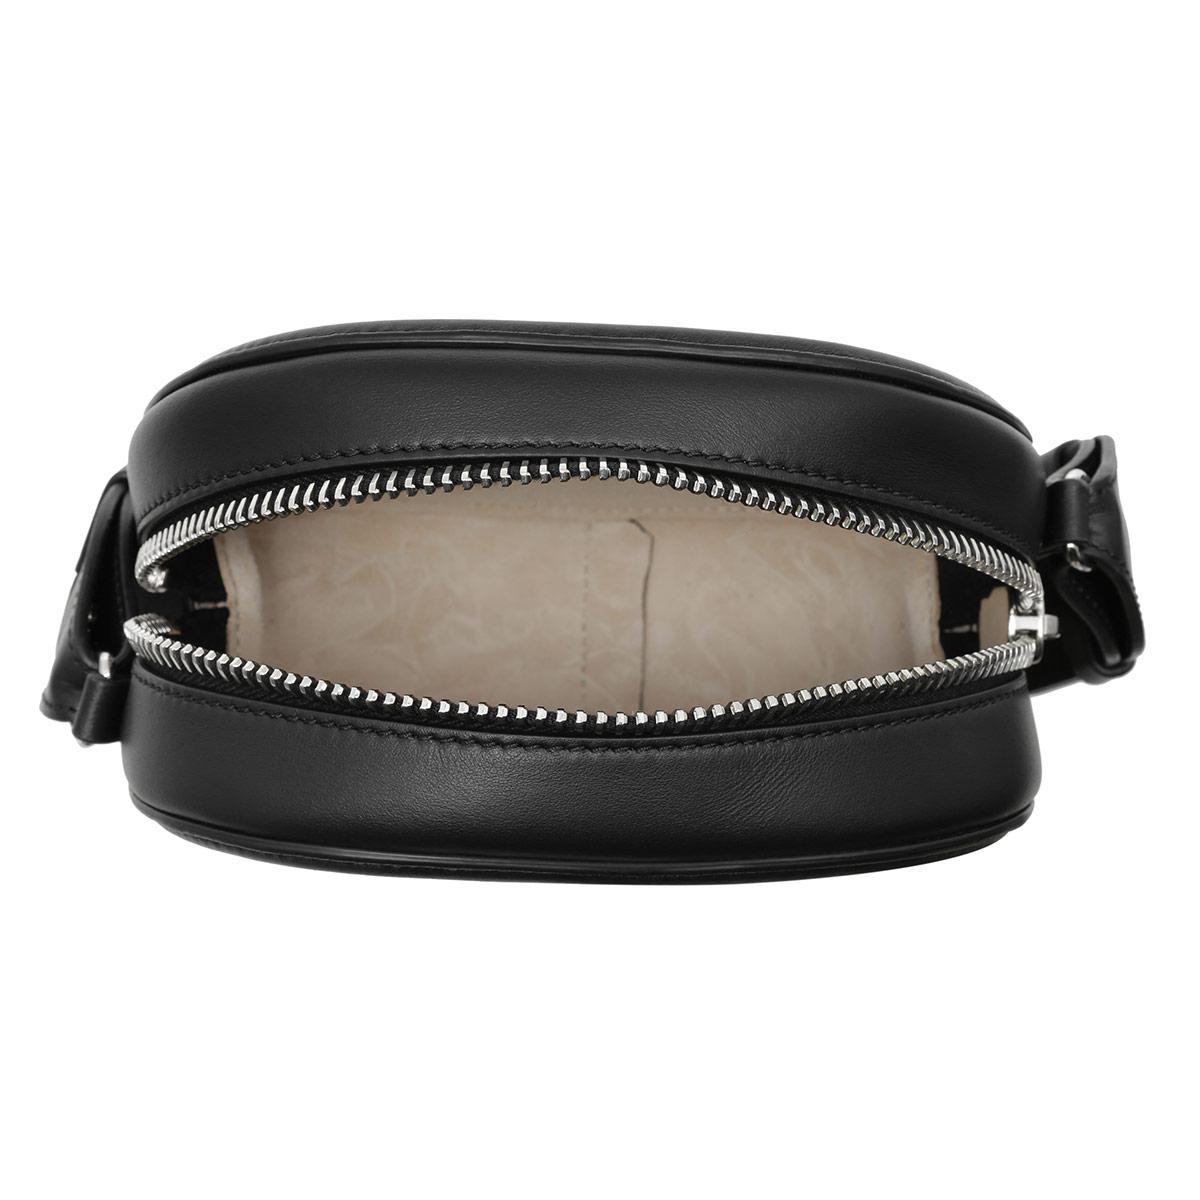 N°21 Leather Bianca Scarpa Knot Crossbody Bag Black